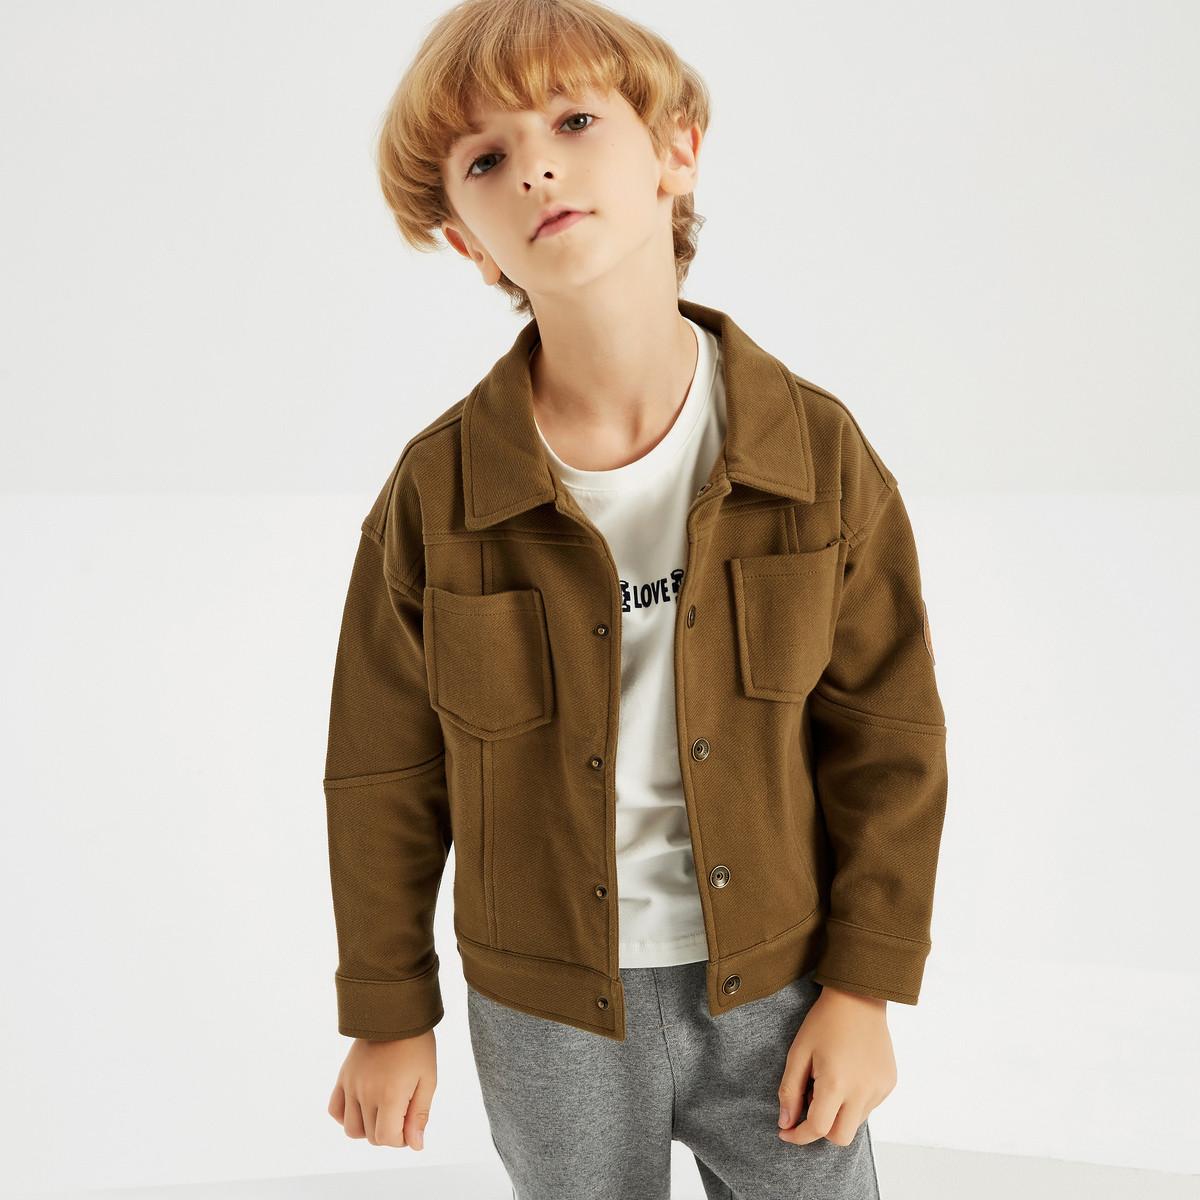 MECITY KIDS米喜迪mecity童装中大童外套男童卫衣秋装茄克式开衫50407350